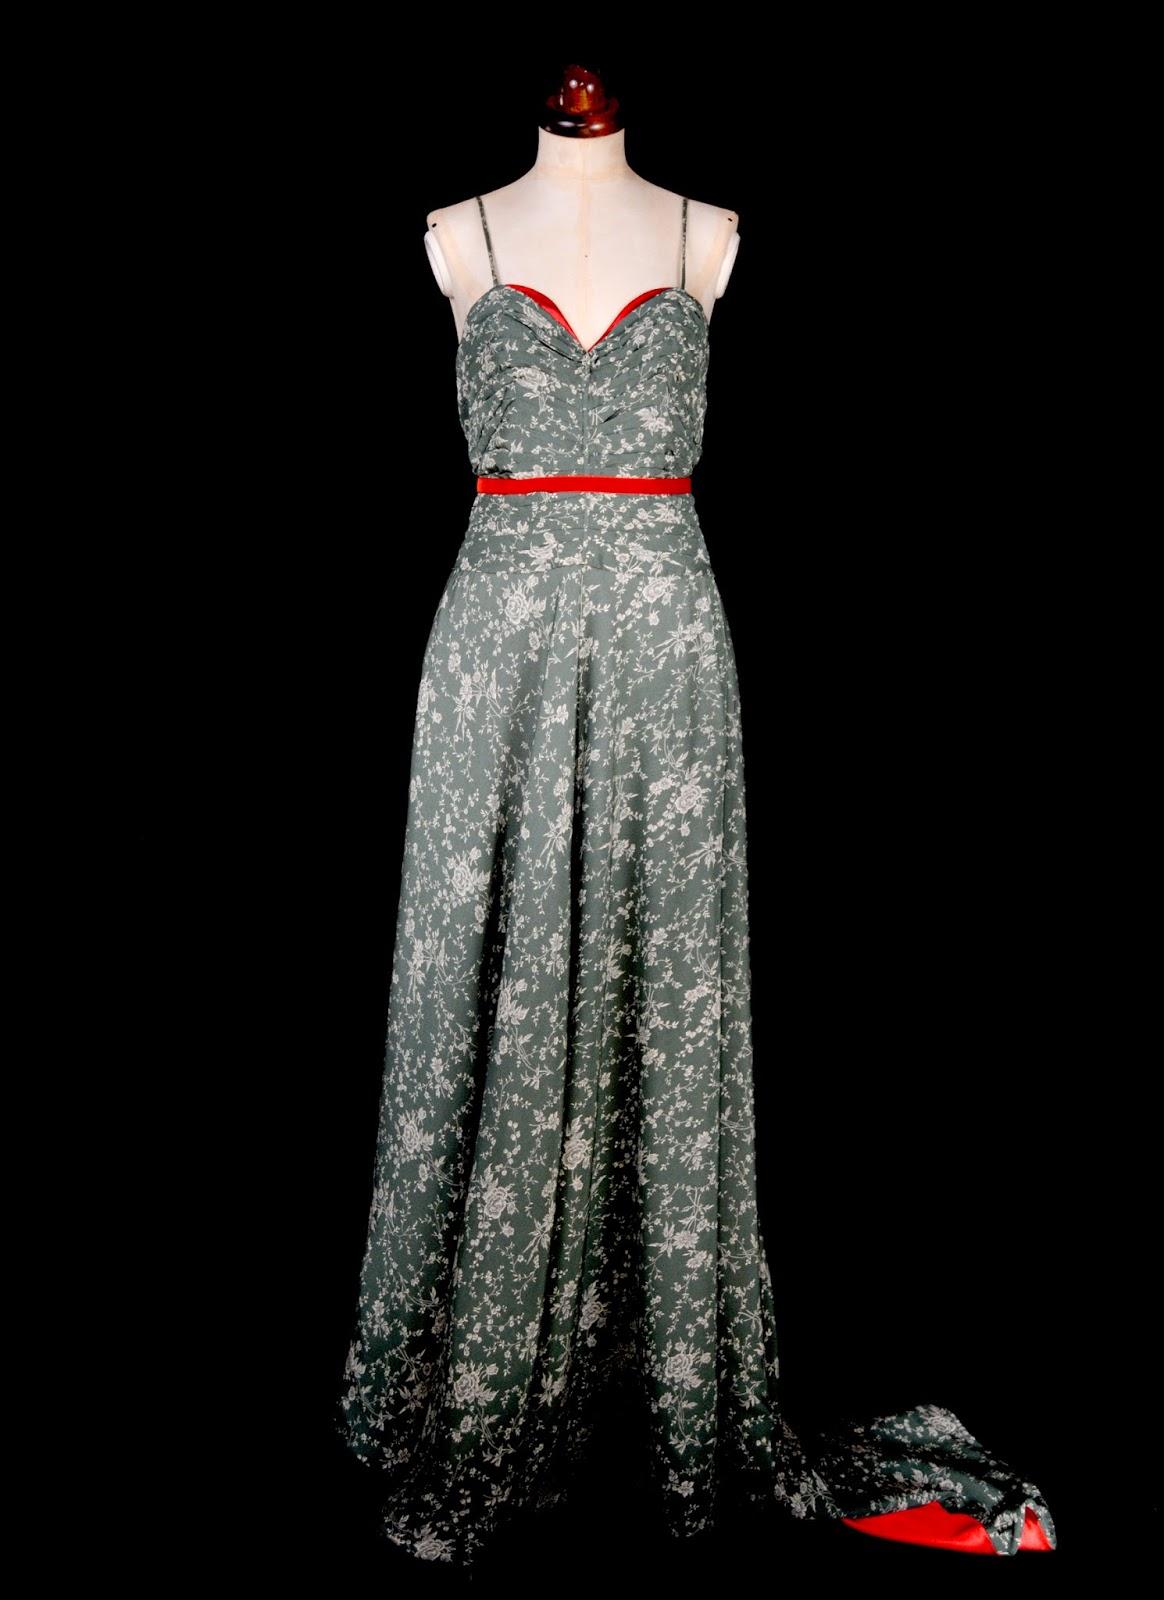 green vintage 1930s dress